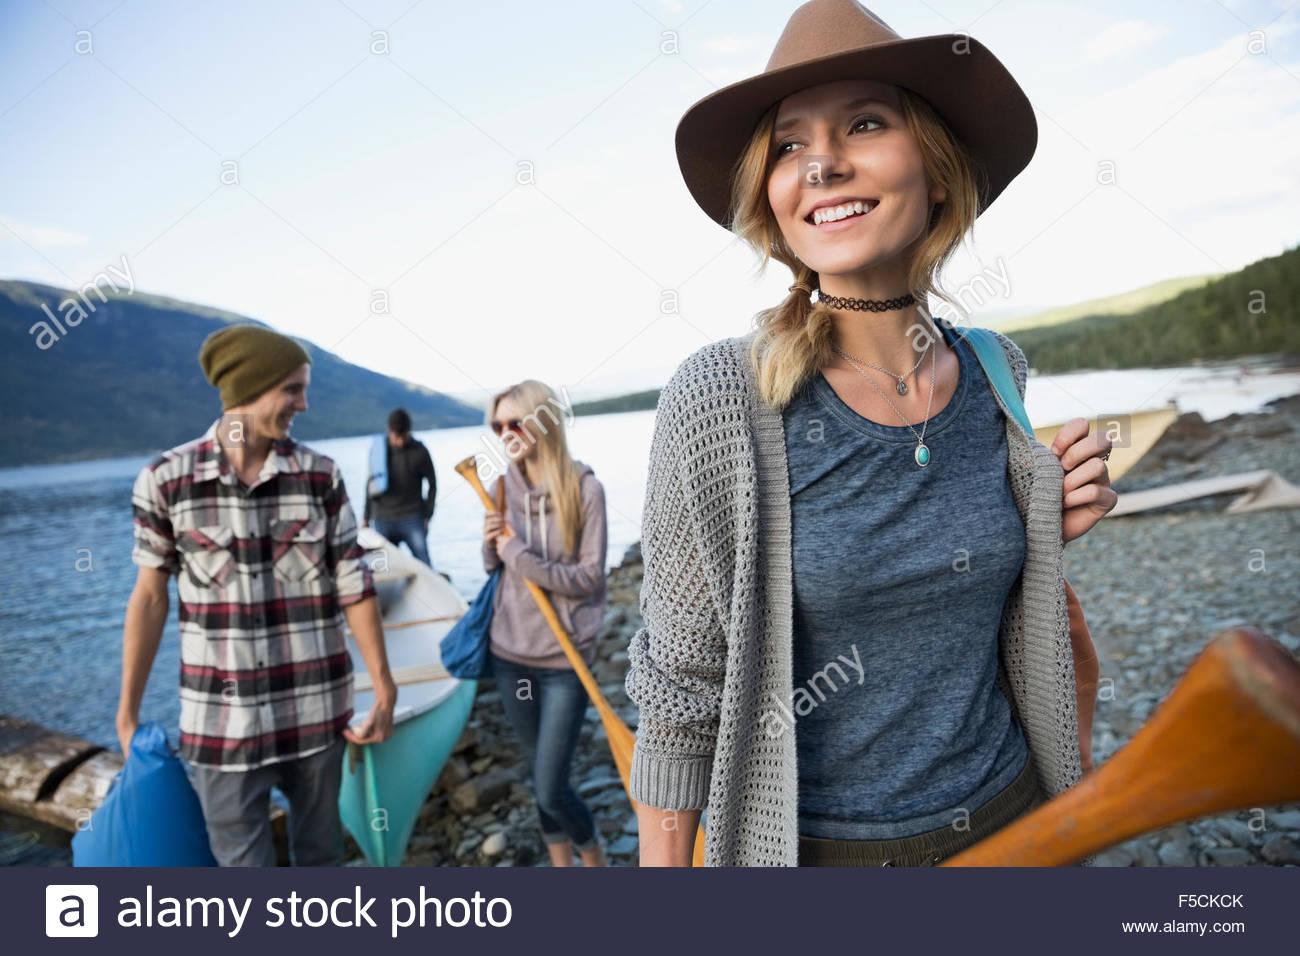 Lächelnde junge Freunde mit Kanu am Seeufer Stockfoto